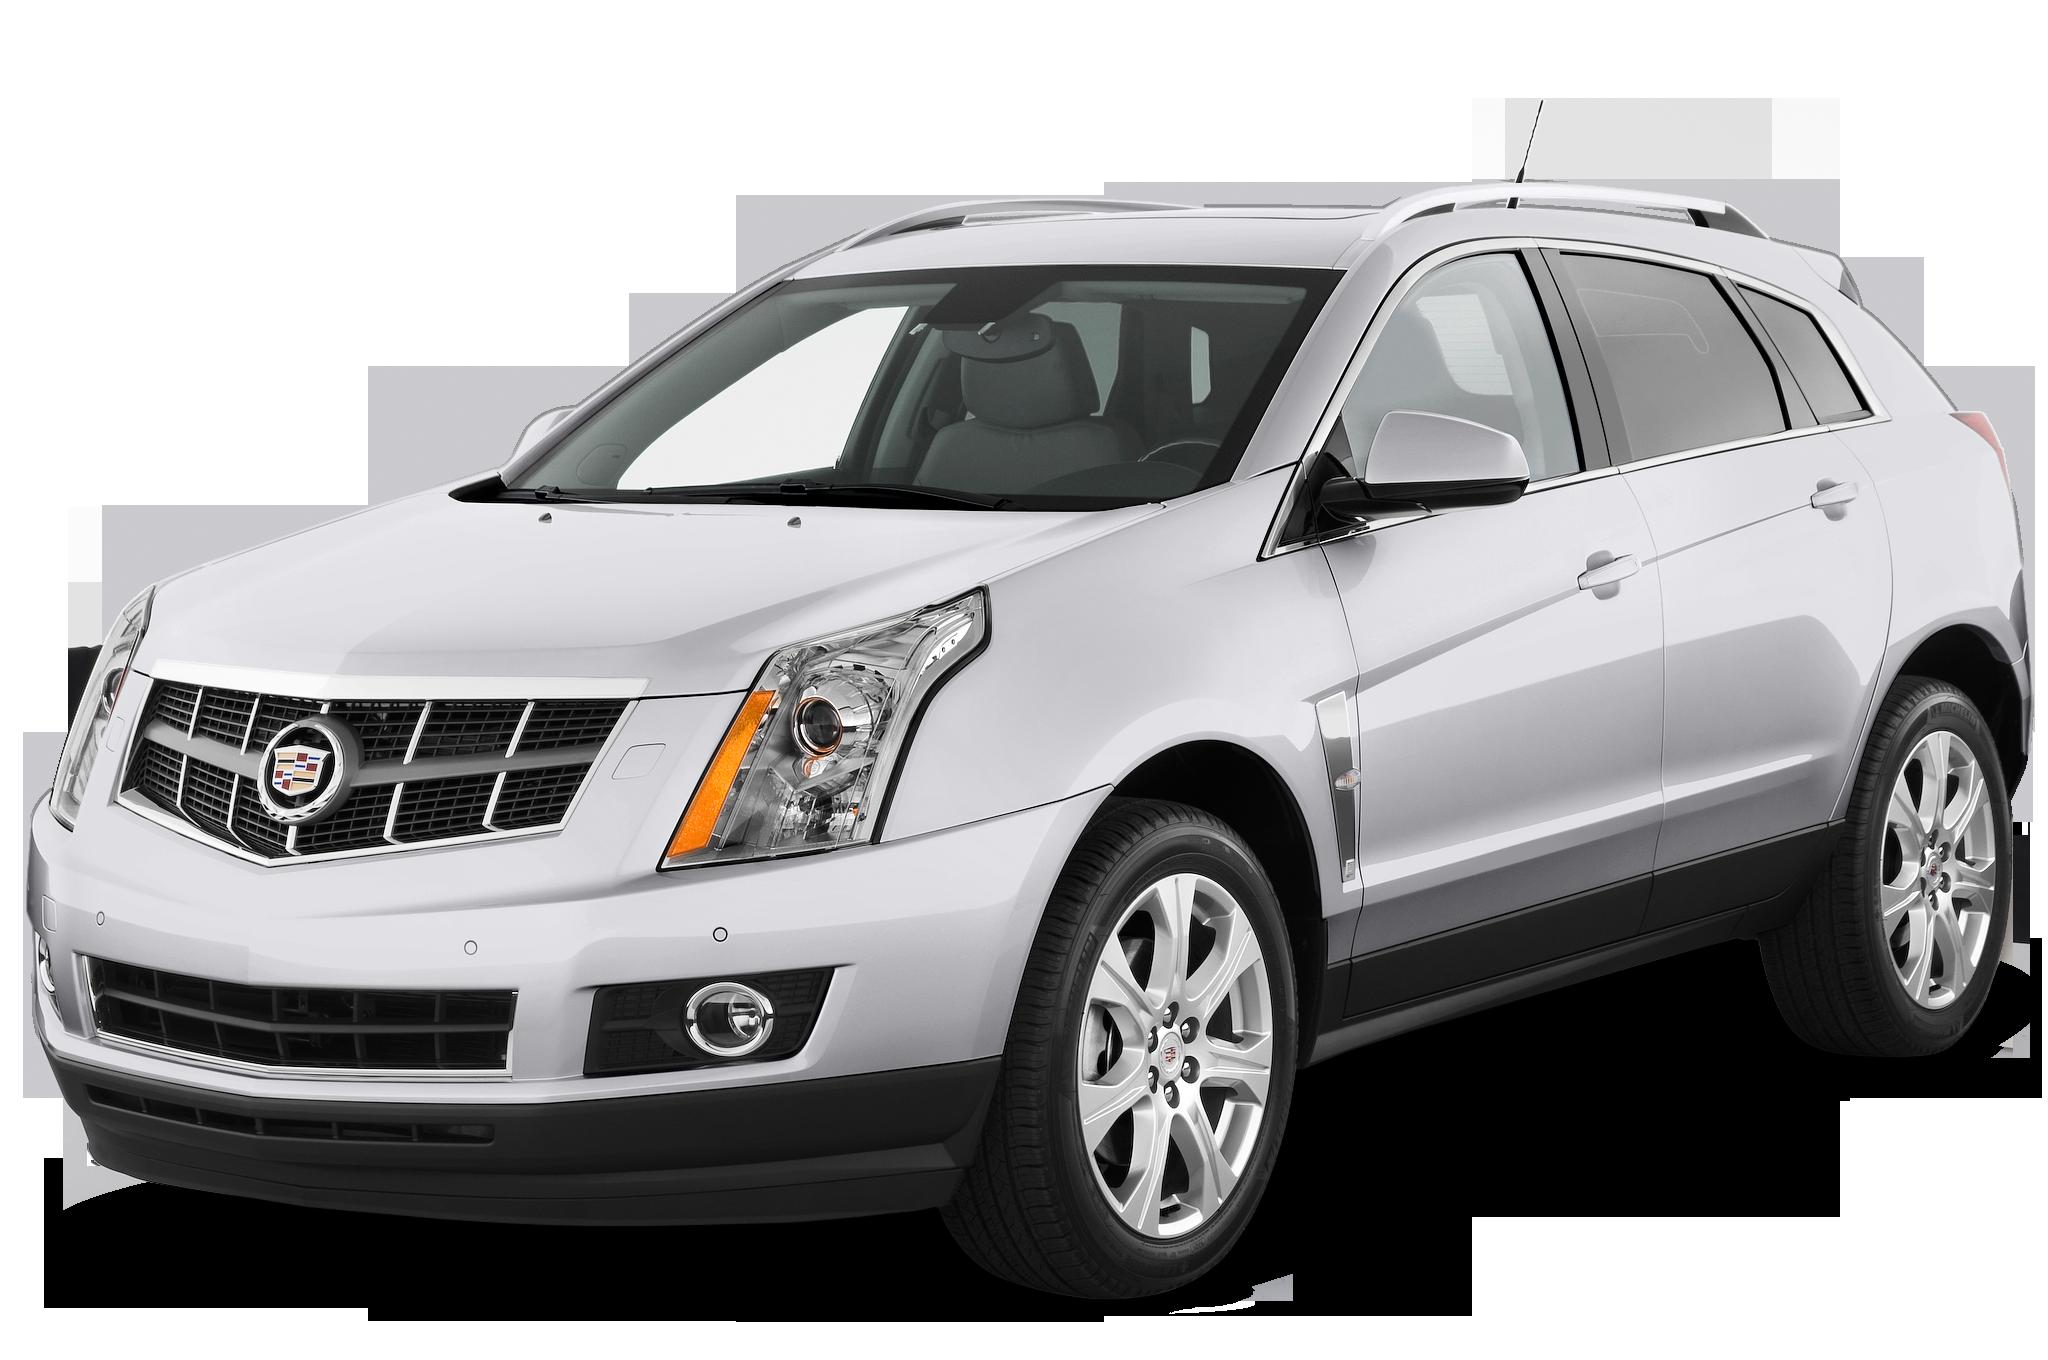 Cadillac SRX I 2003 - 2009 SUV 5 door #1